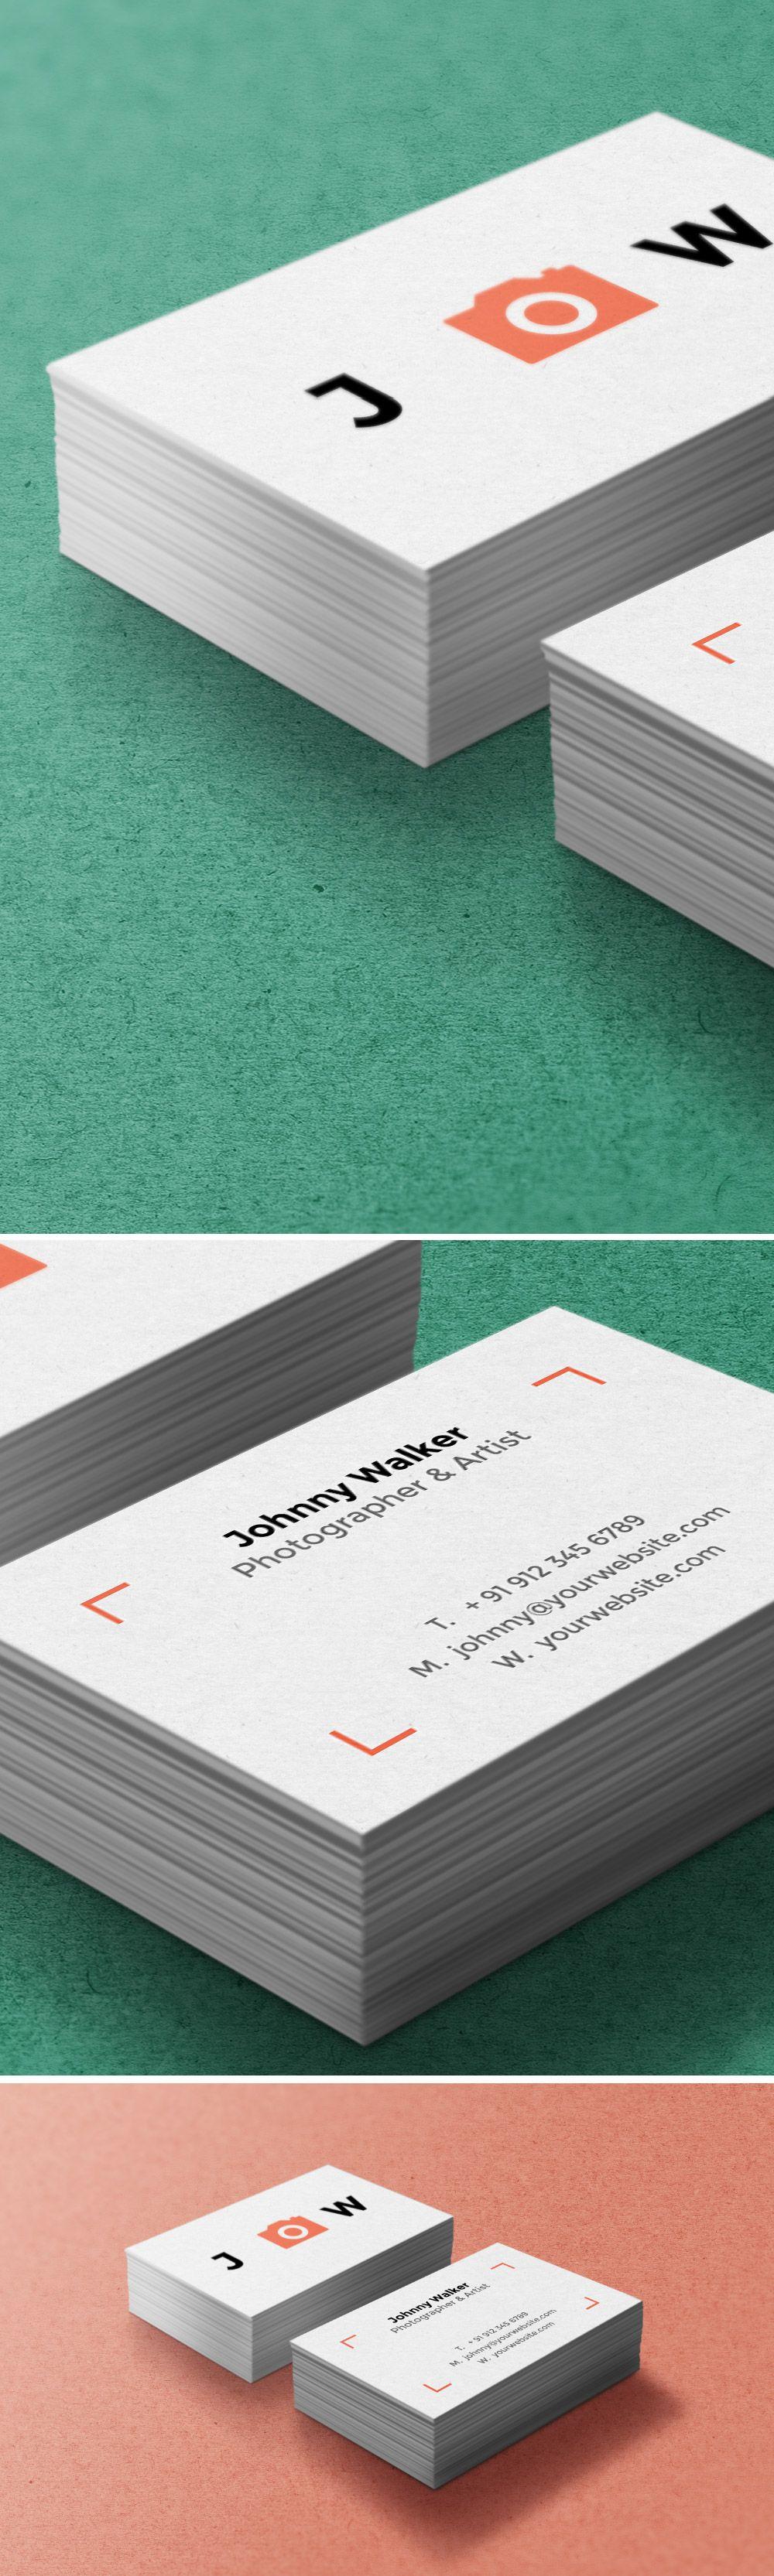 Free Business Cards Mockup Business Card Mock Up Business Cards Mockup Psd Free Business Card Mockup